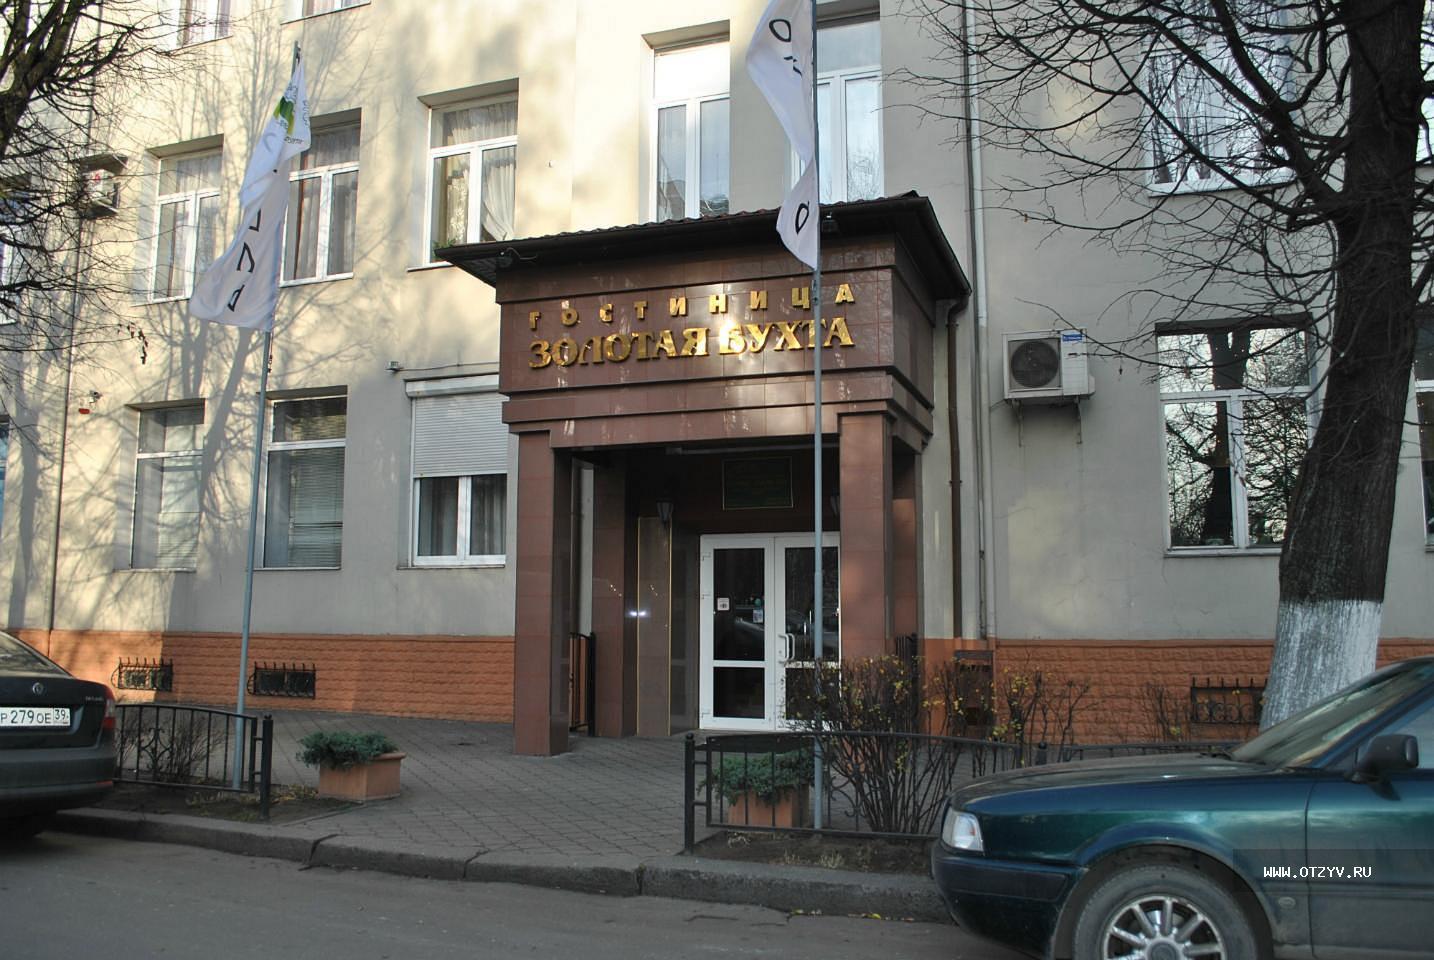 Гостиница Золотая бухта (Калининград)